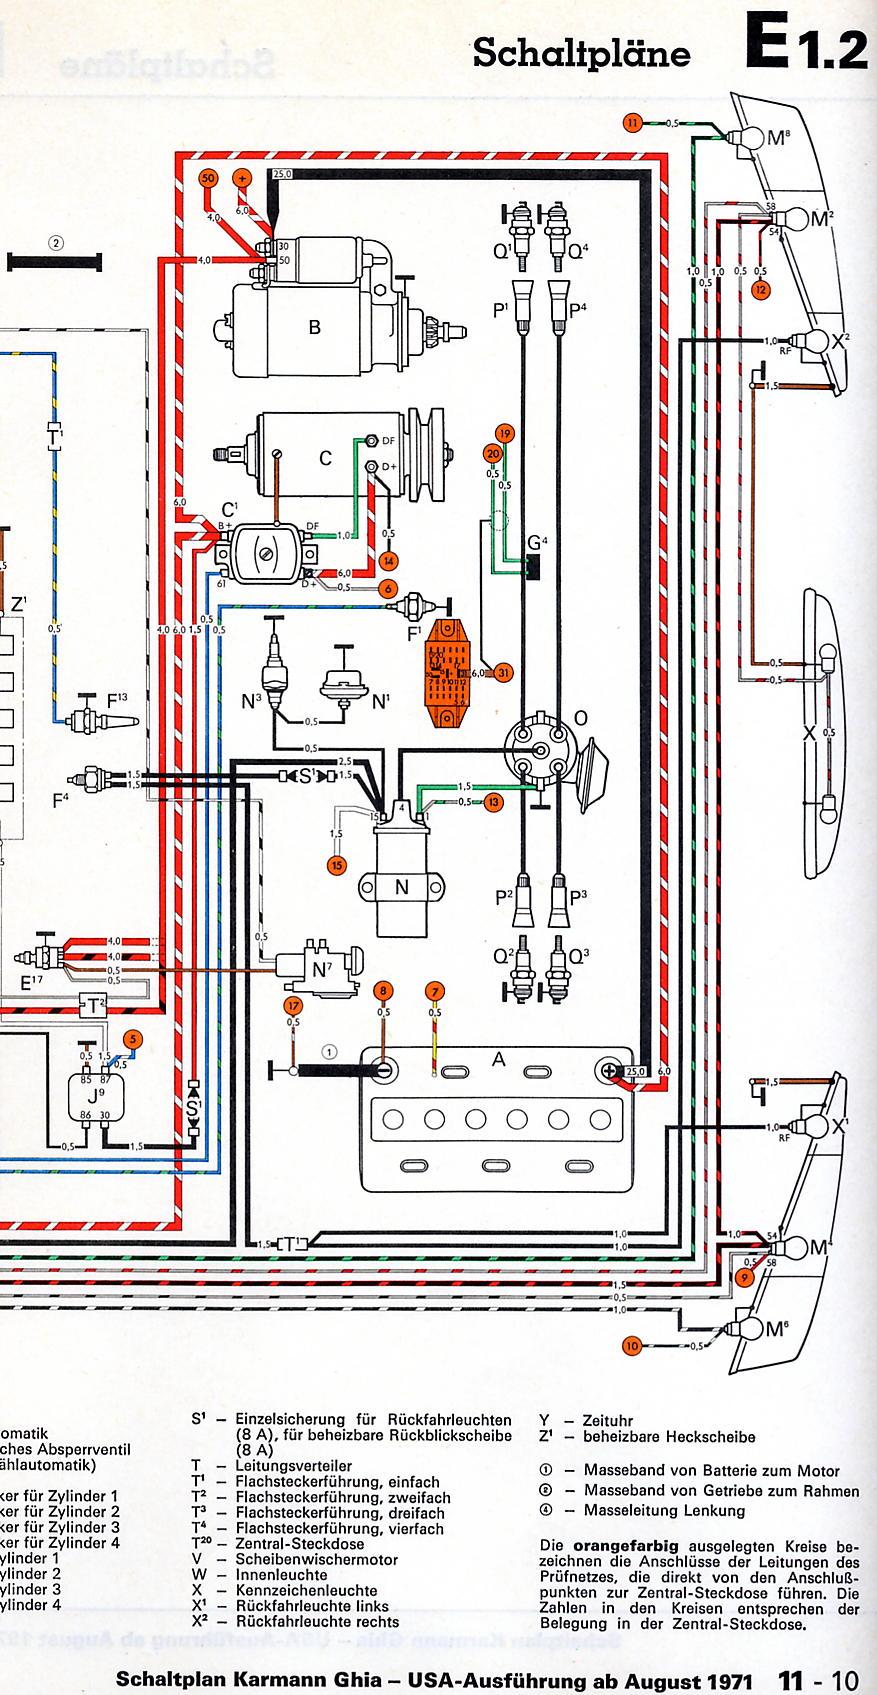 Db 4139 Ghia Wiring Diagram 1971 Karmann Ghia Wiring Diagram 1969 Karmann Ghia Download Diagram